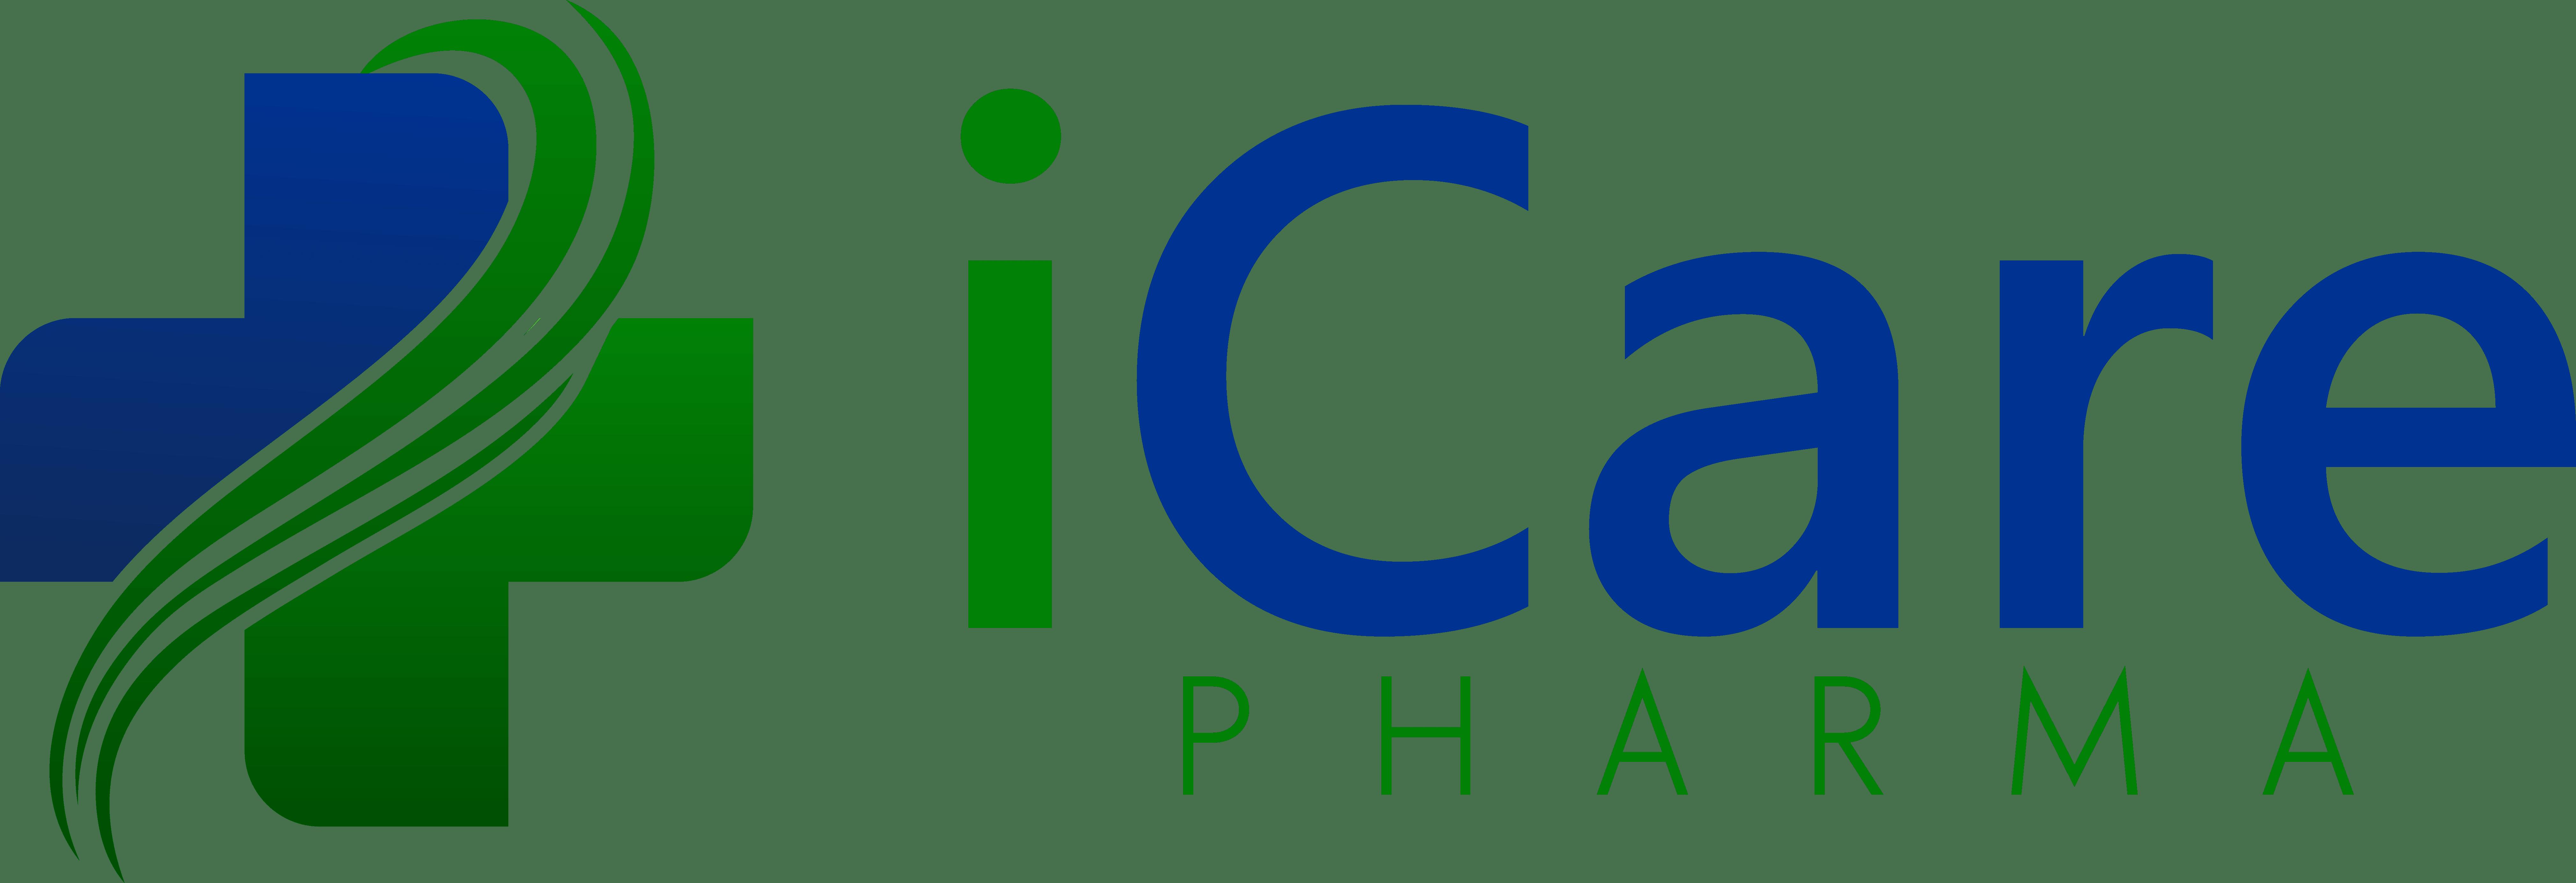 iCare Pharma